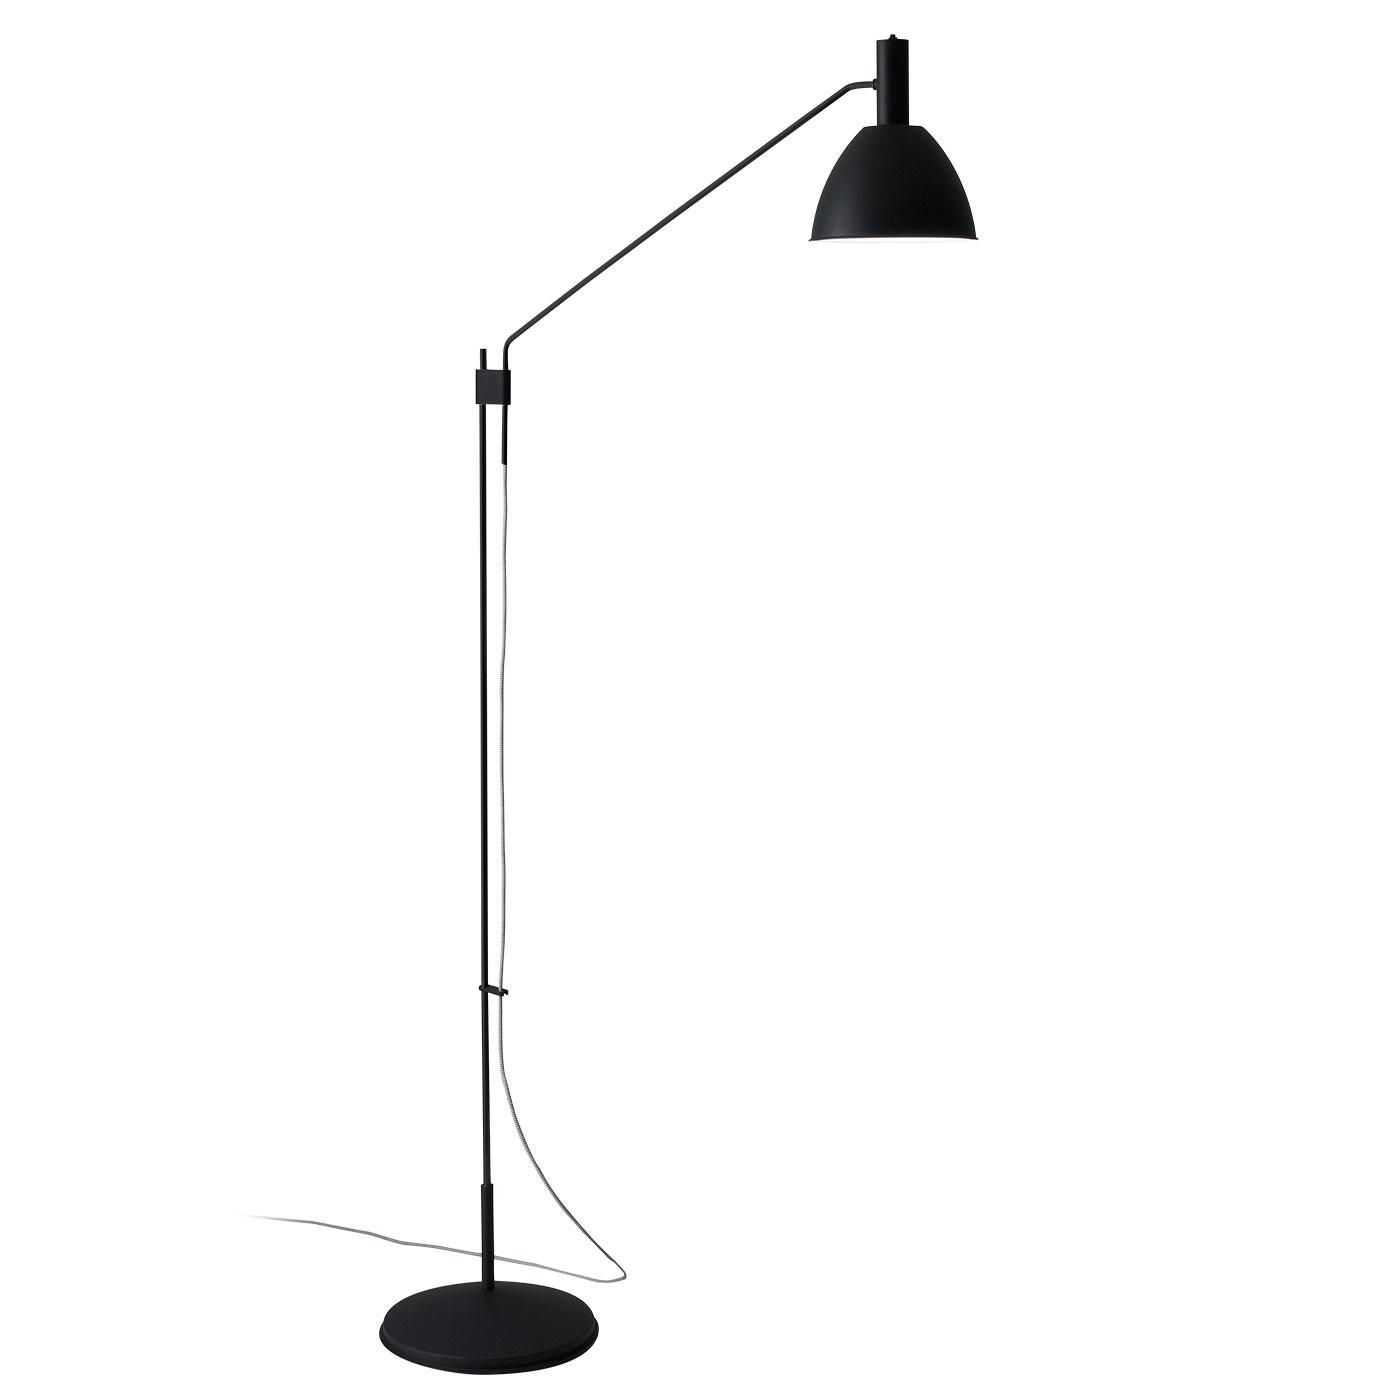 Lumini Bauhaus 90 Stehleuchte